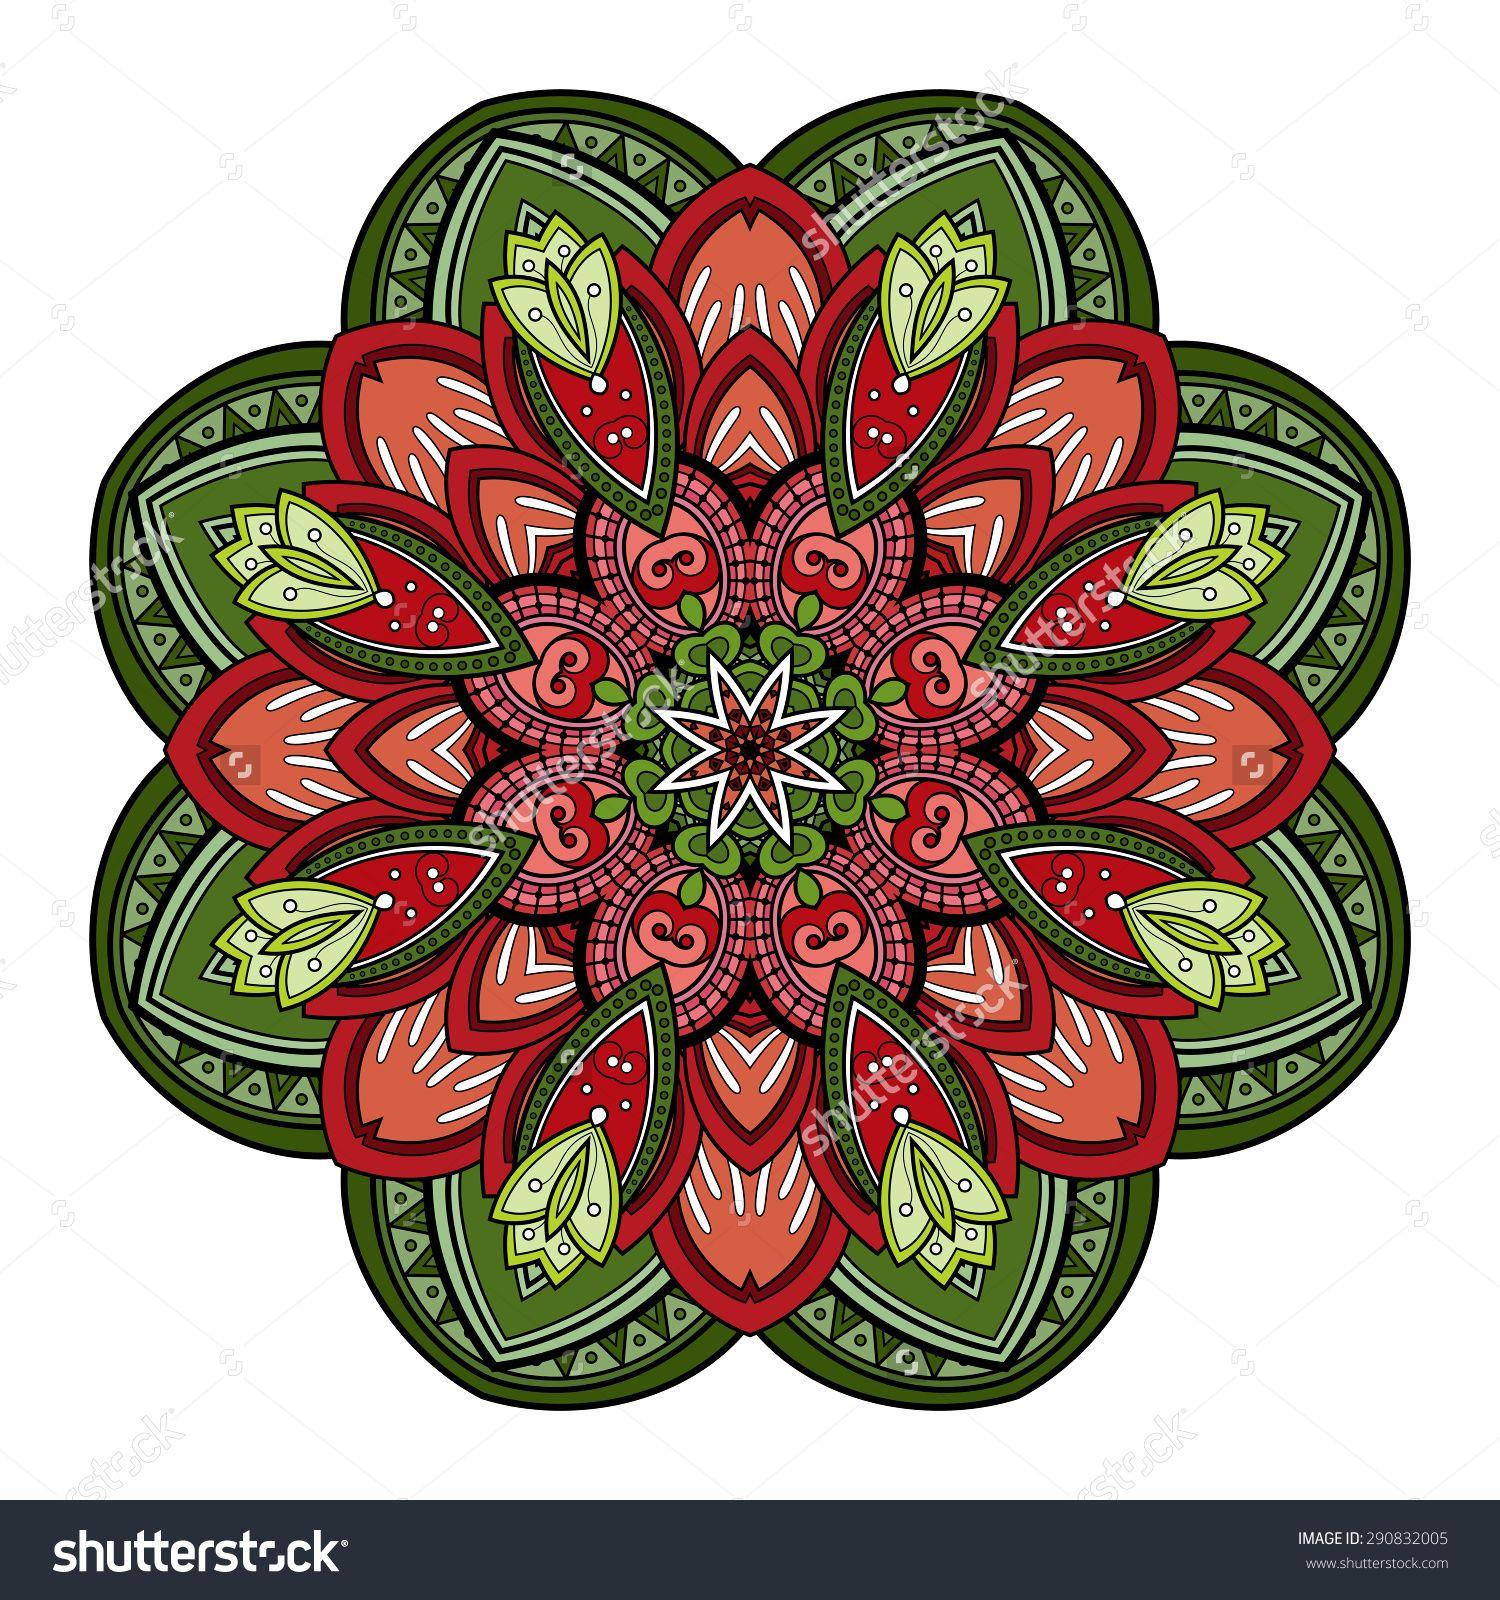 colored mandalas - Google Search                                                                                                                                                                                 More